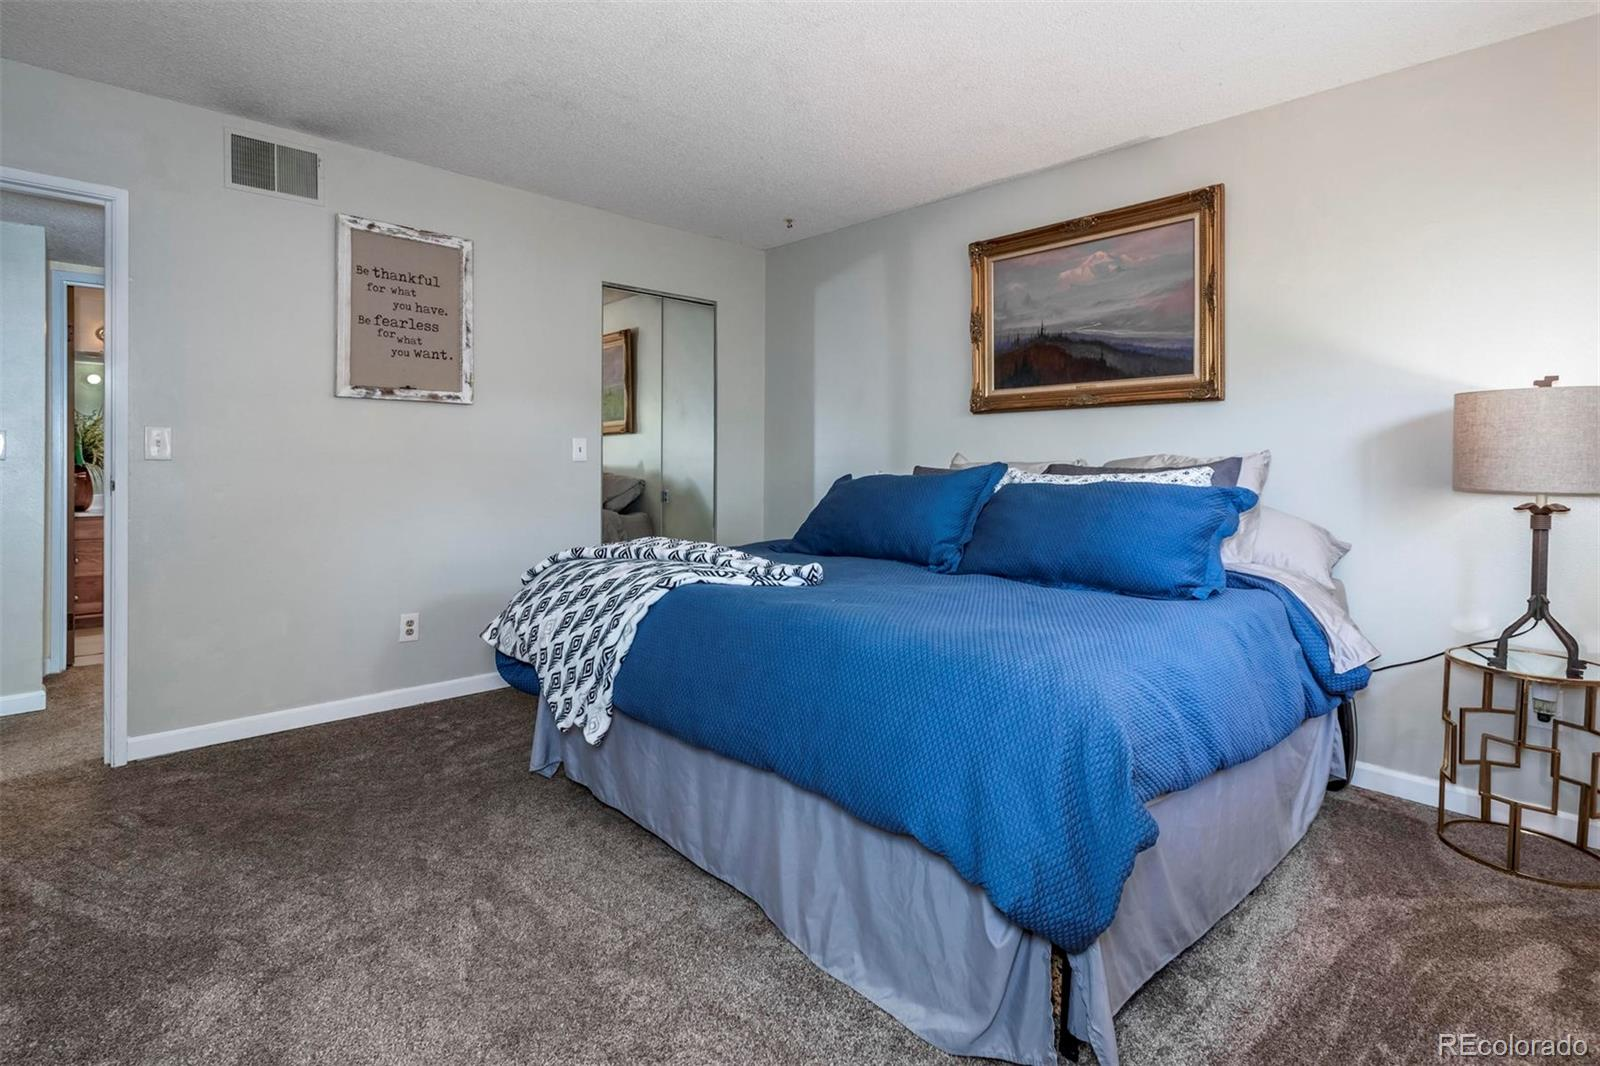 MLS# 6340316 - 12 - 420 Zang Street #3-102, Lakewood, CO 80228